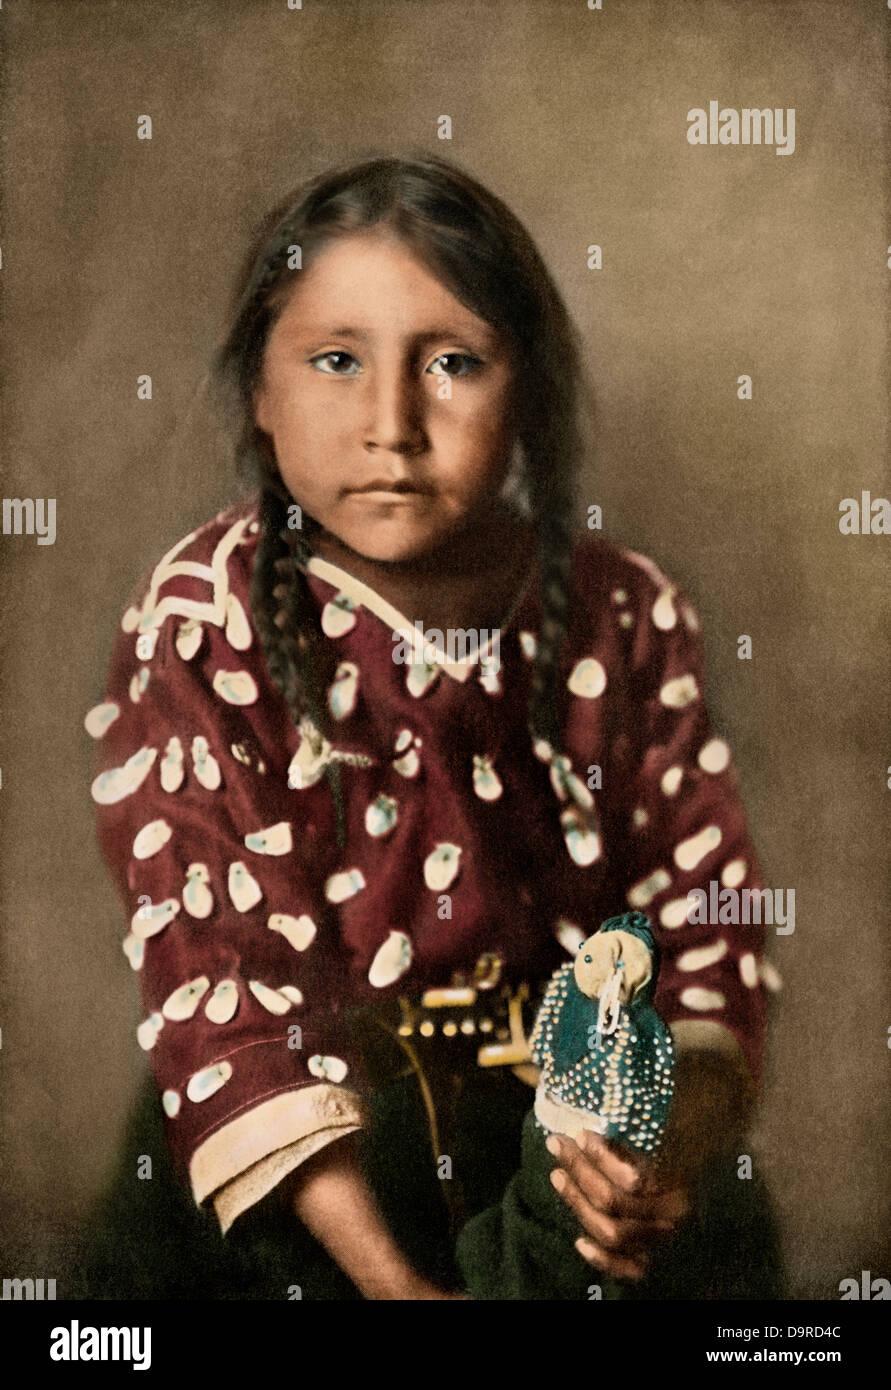 Krähe indische Mädchen Glydis Littlenest oder Fahrten - a - Sorrel-Horse, ca. 1900. Hand - farbige Raster Stockbild